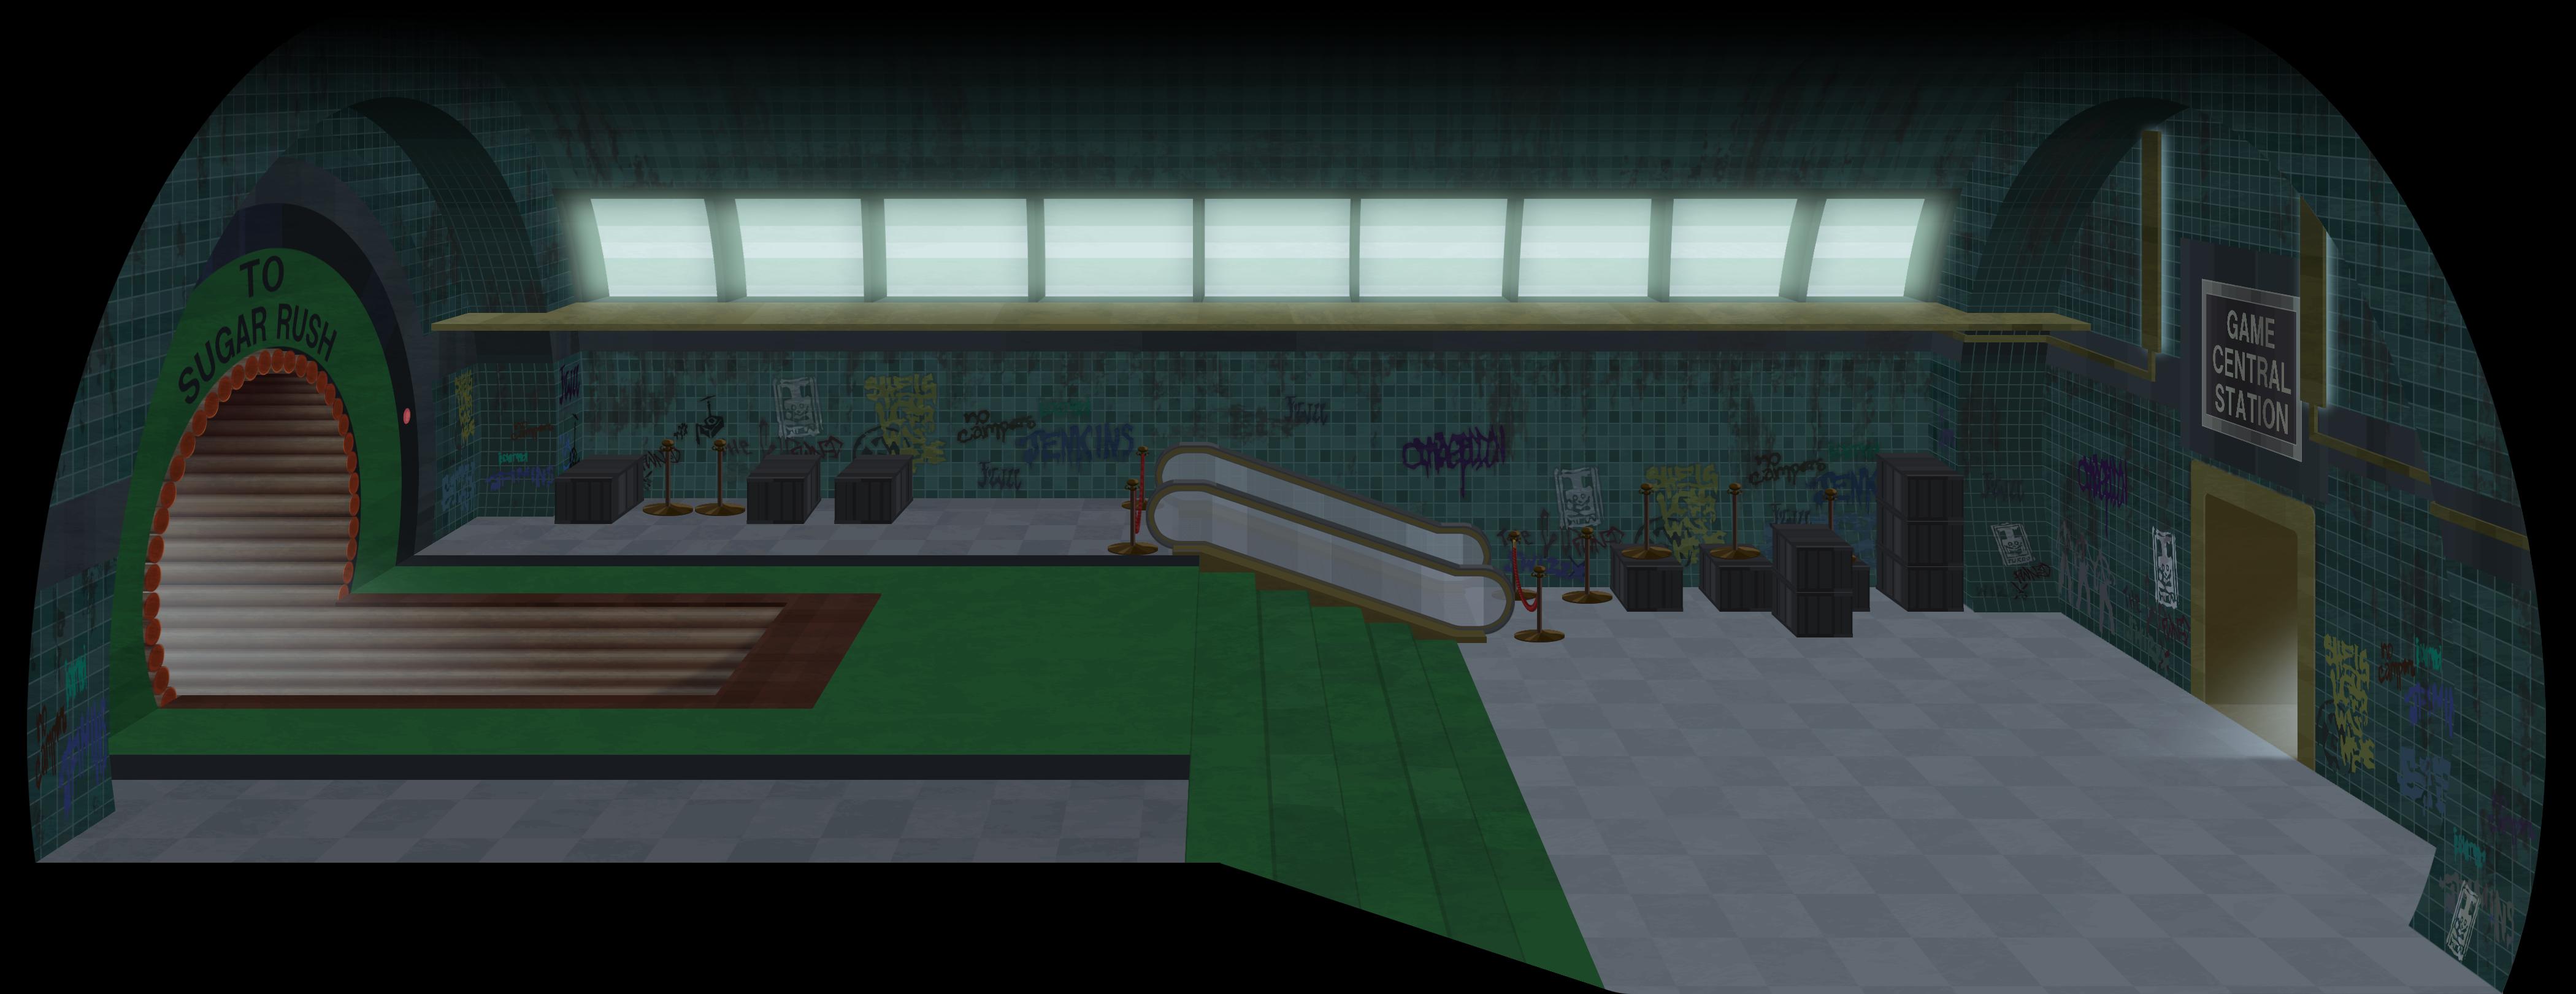 Game_Central_Station_0001.png